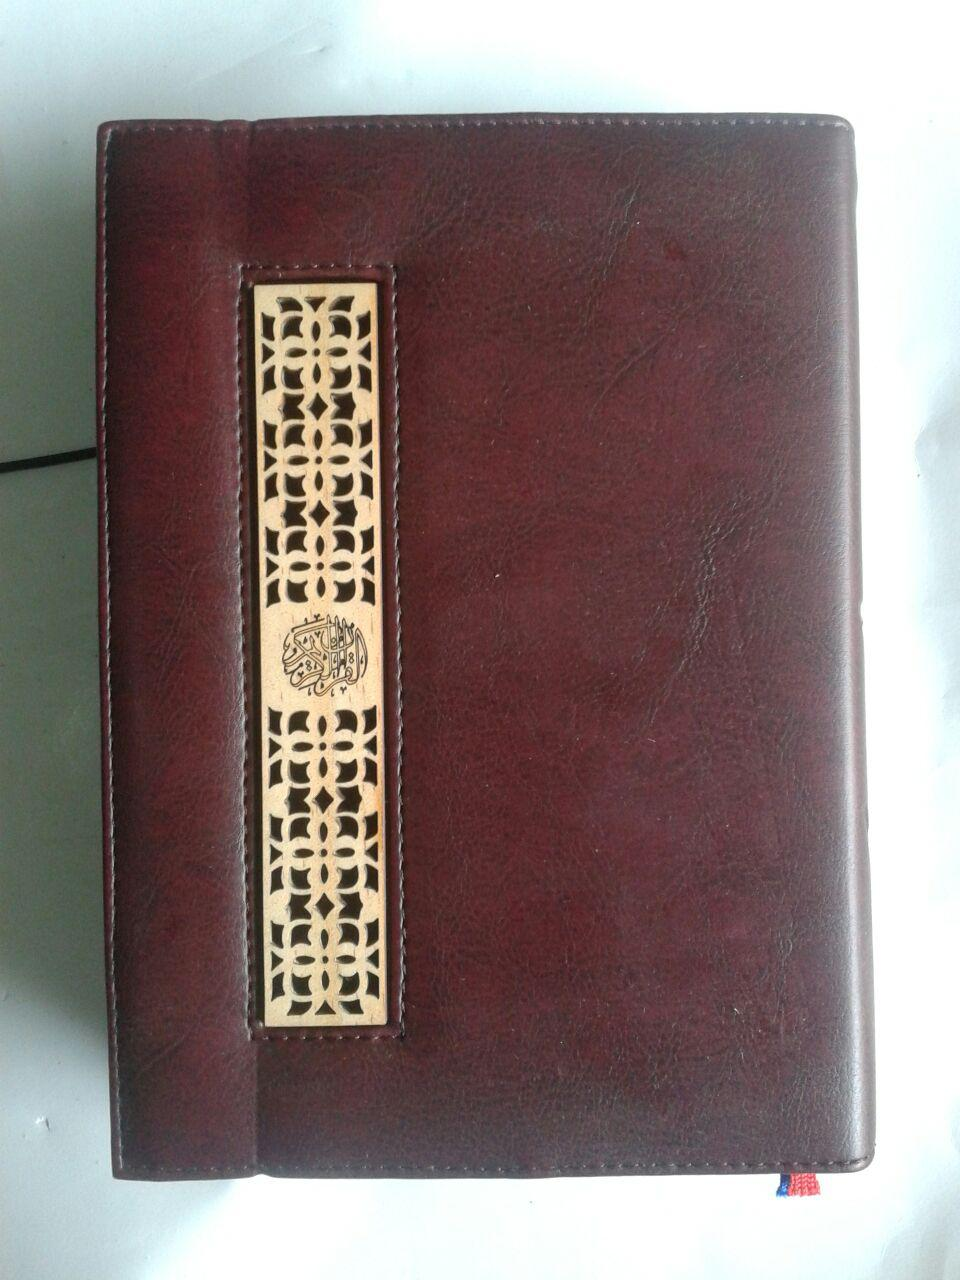 Al-Qur'an Tajwid Bukhara Ukuran A5 Sampul Agenda Tali cover